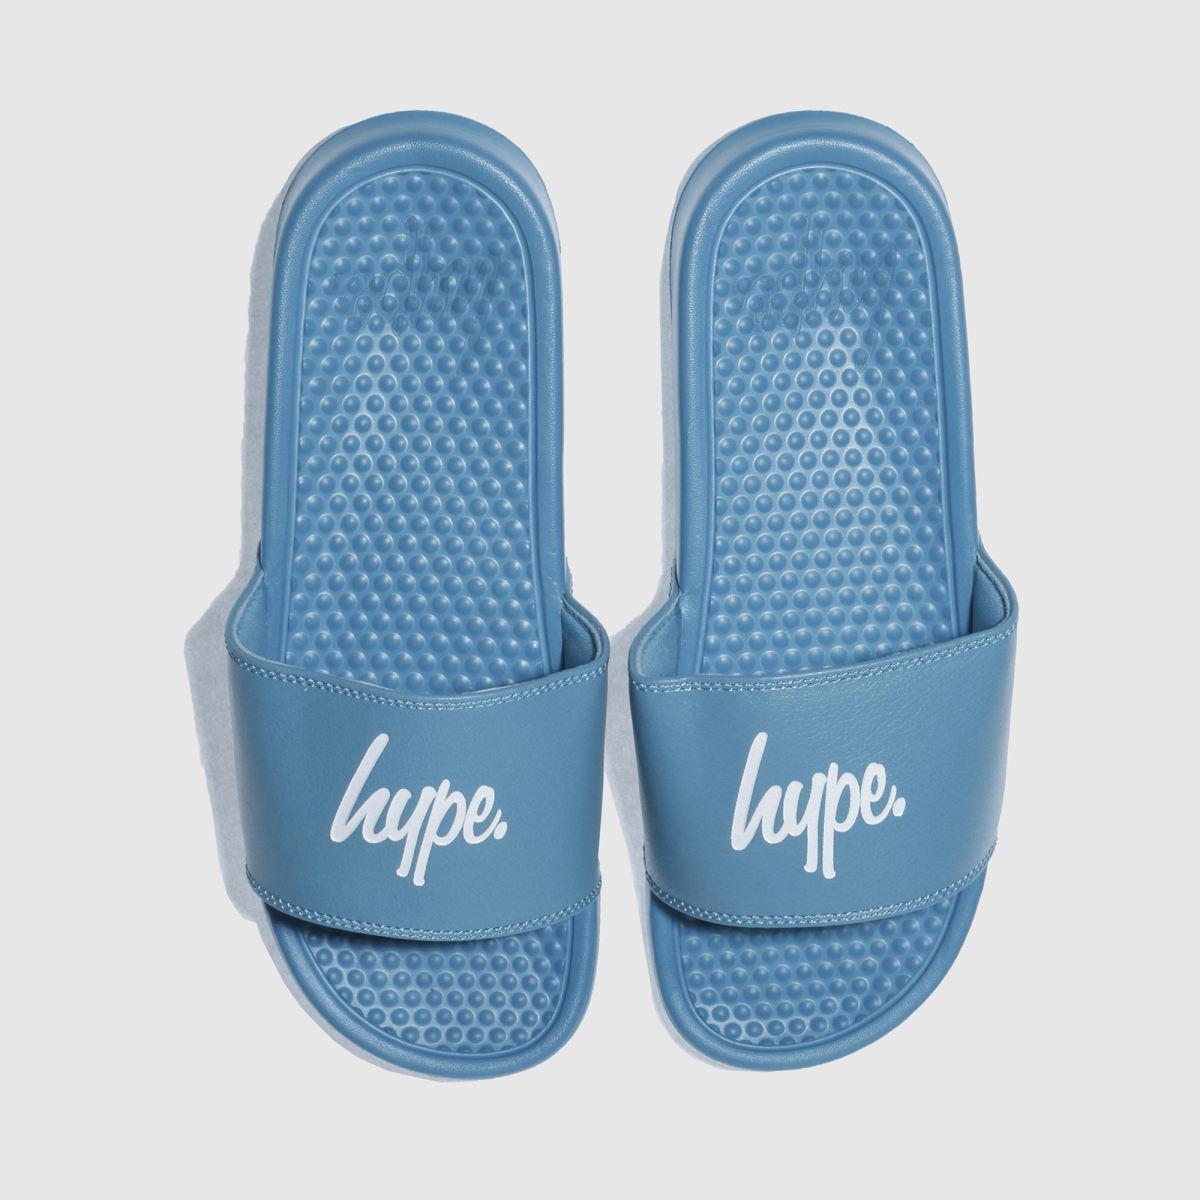 Hype Hype Turquoise Block Slider Sandals